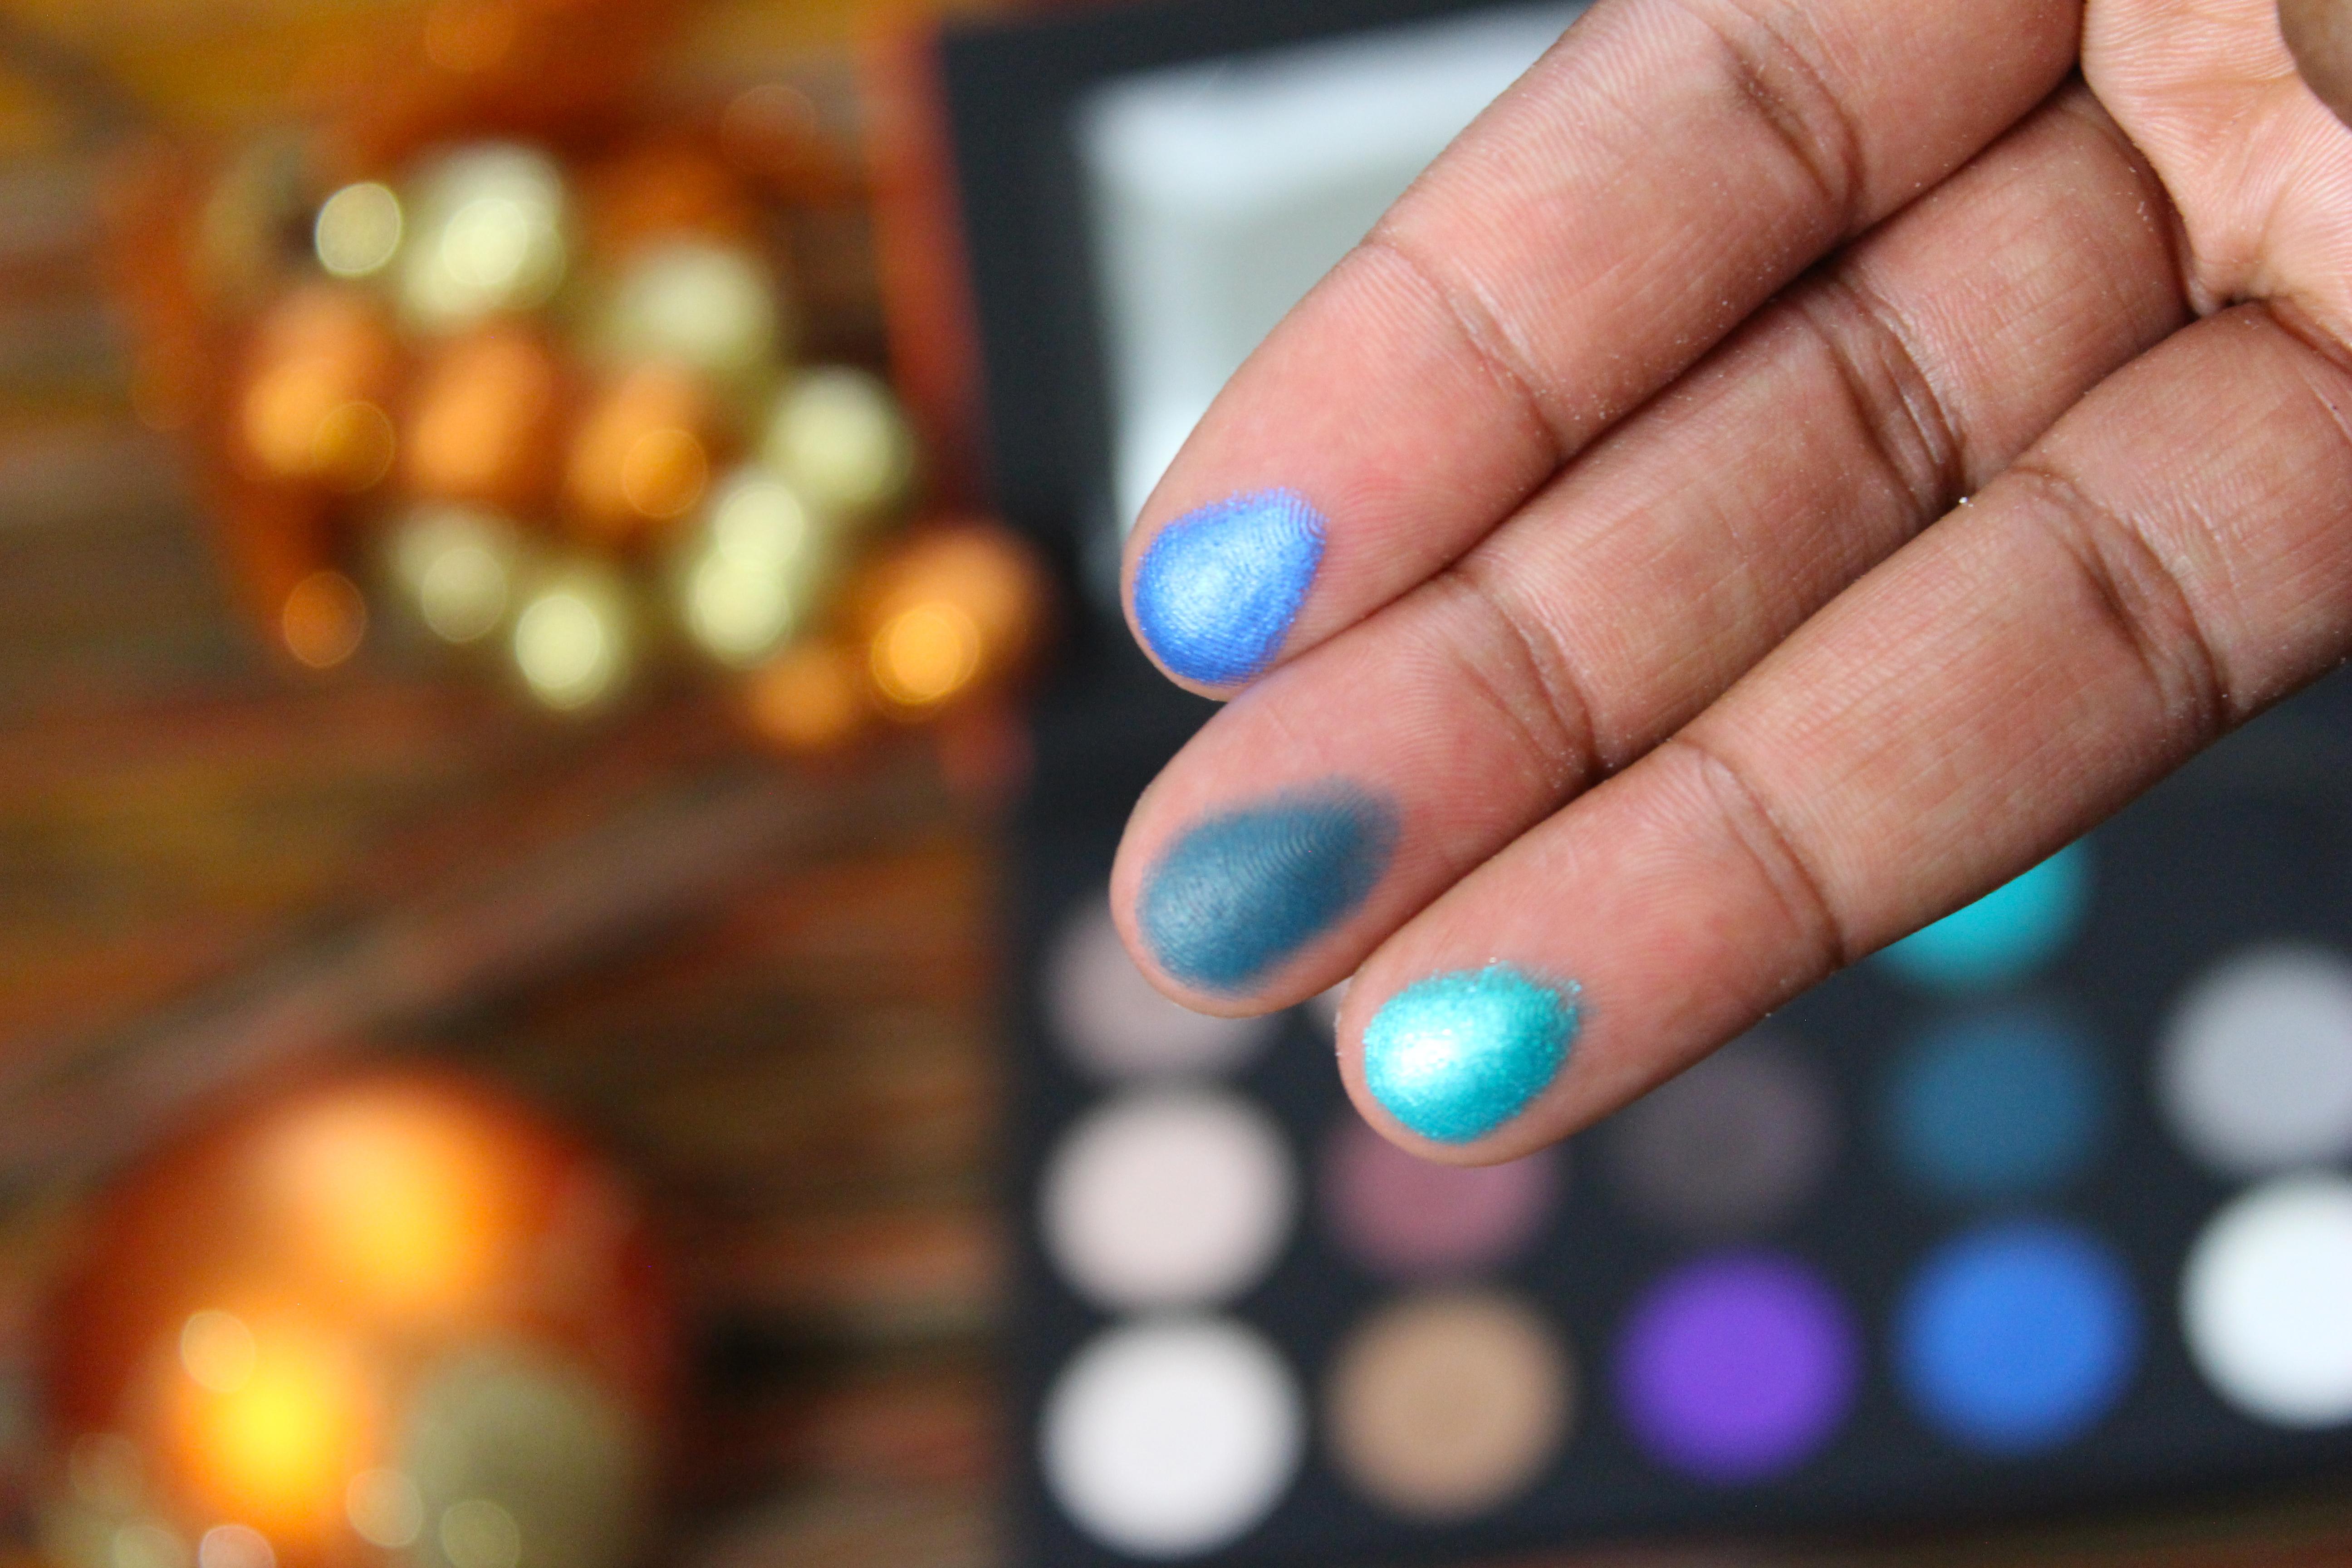 makeup forever 15 artist shadow palette